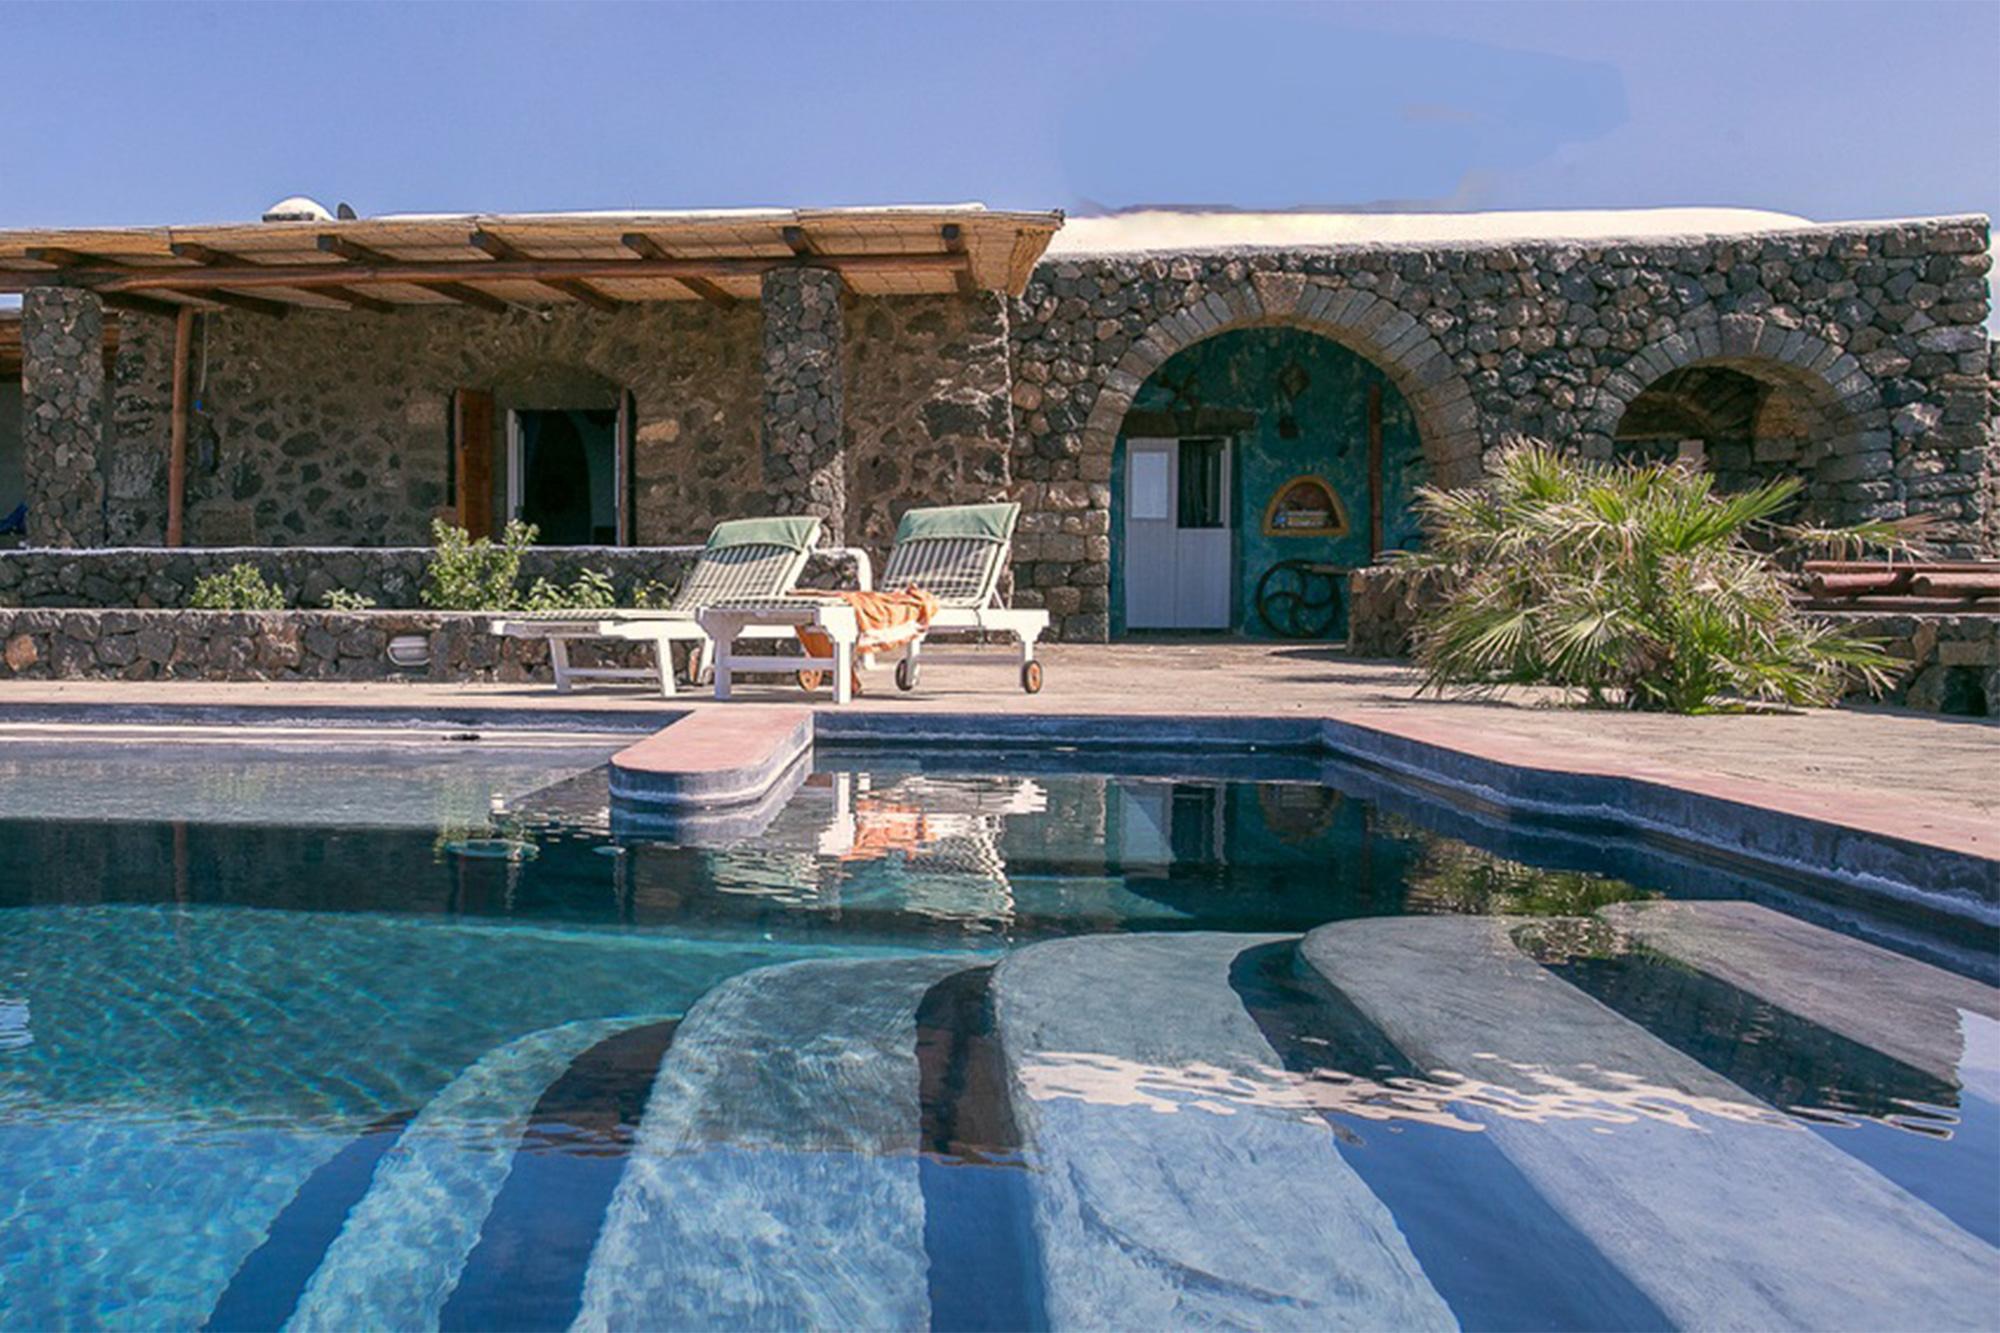 Dammuso-Margana-Real-Estate-Pantelleria-Immobiliare-Affitto-9